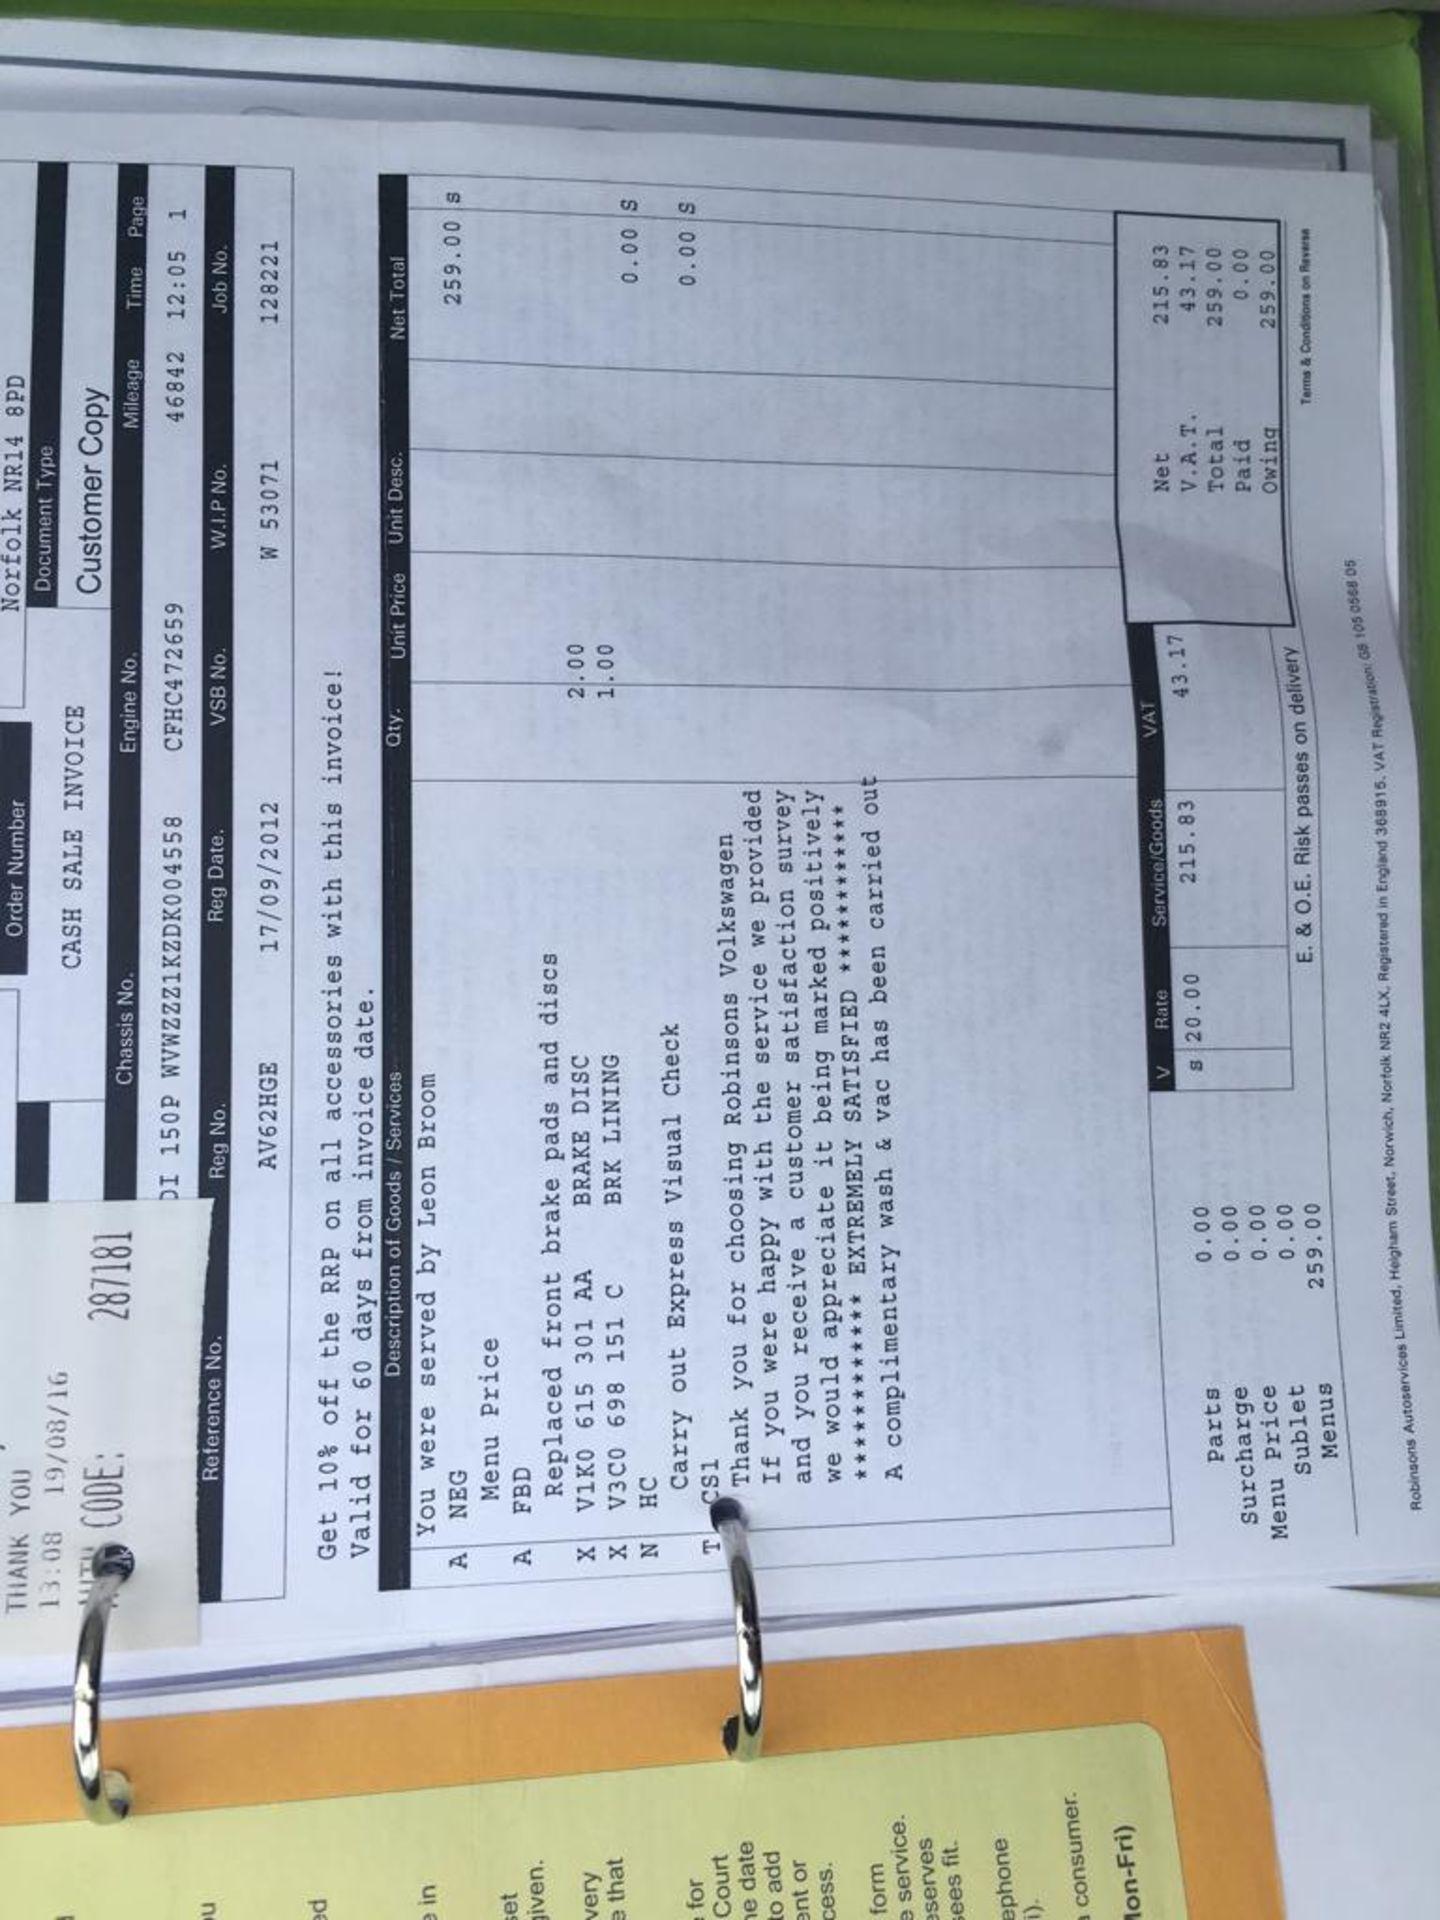 Lot 10 - 2012 VOLKSWAGEN GOLF GT BLUEMOTION TECH TDI CONVERTIBLE